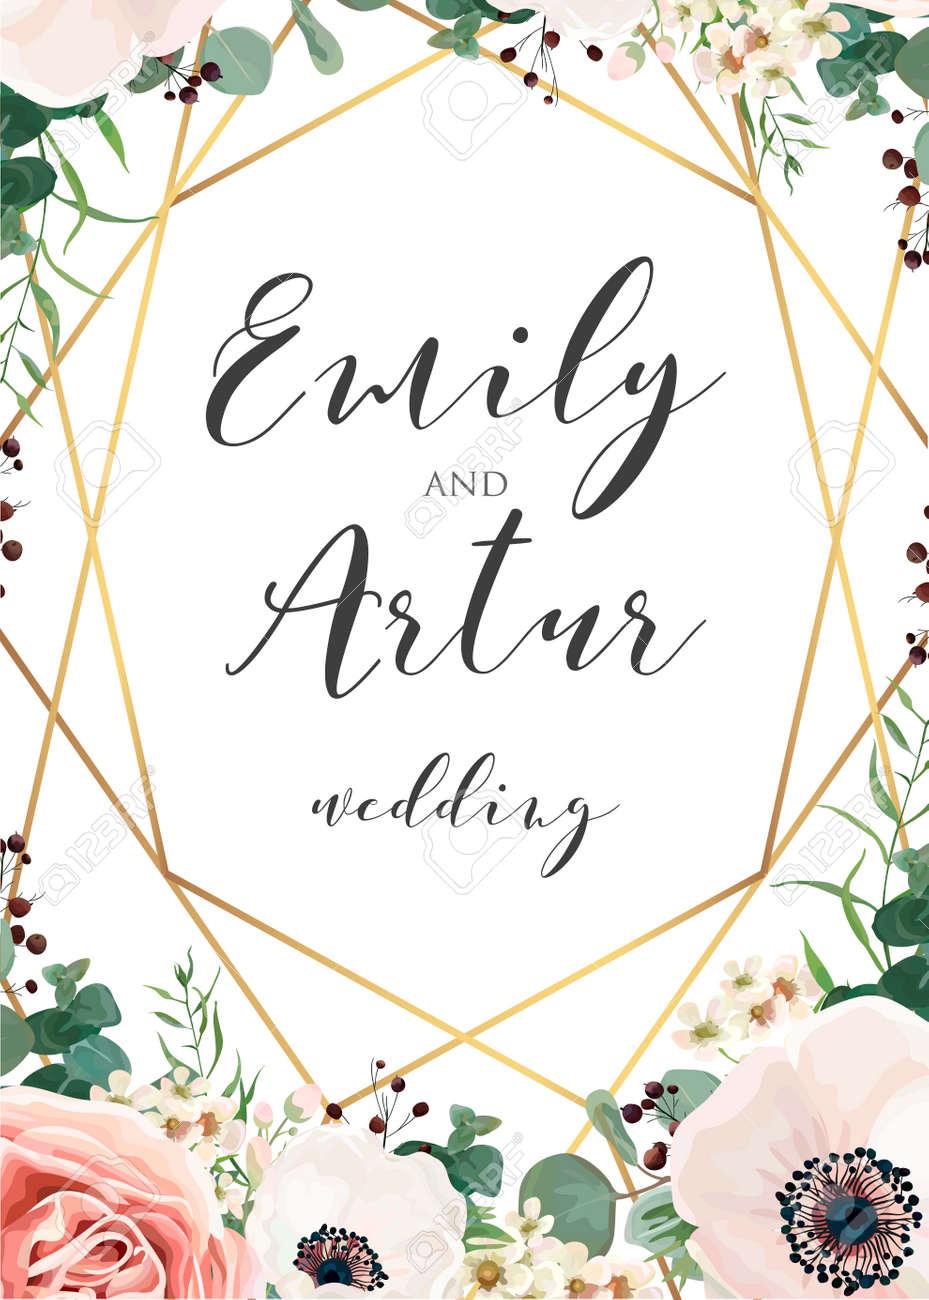 wedding elegant invite invitation save the date card design